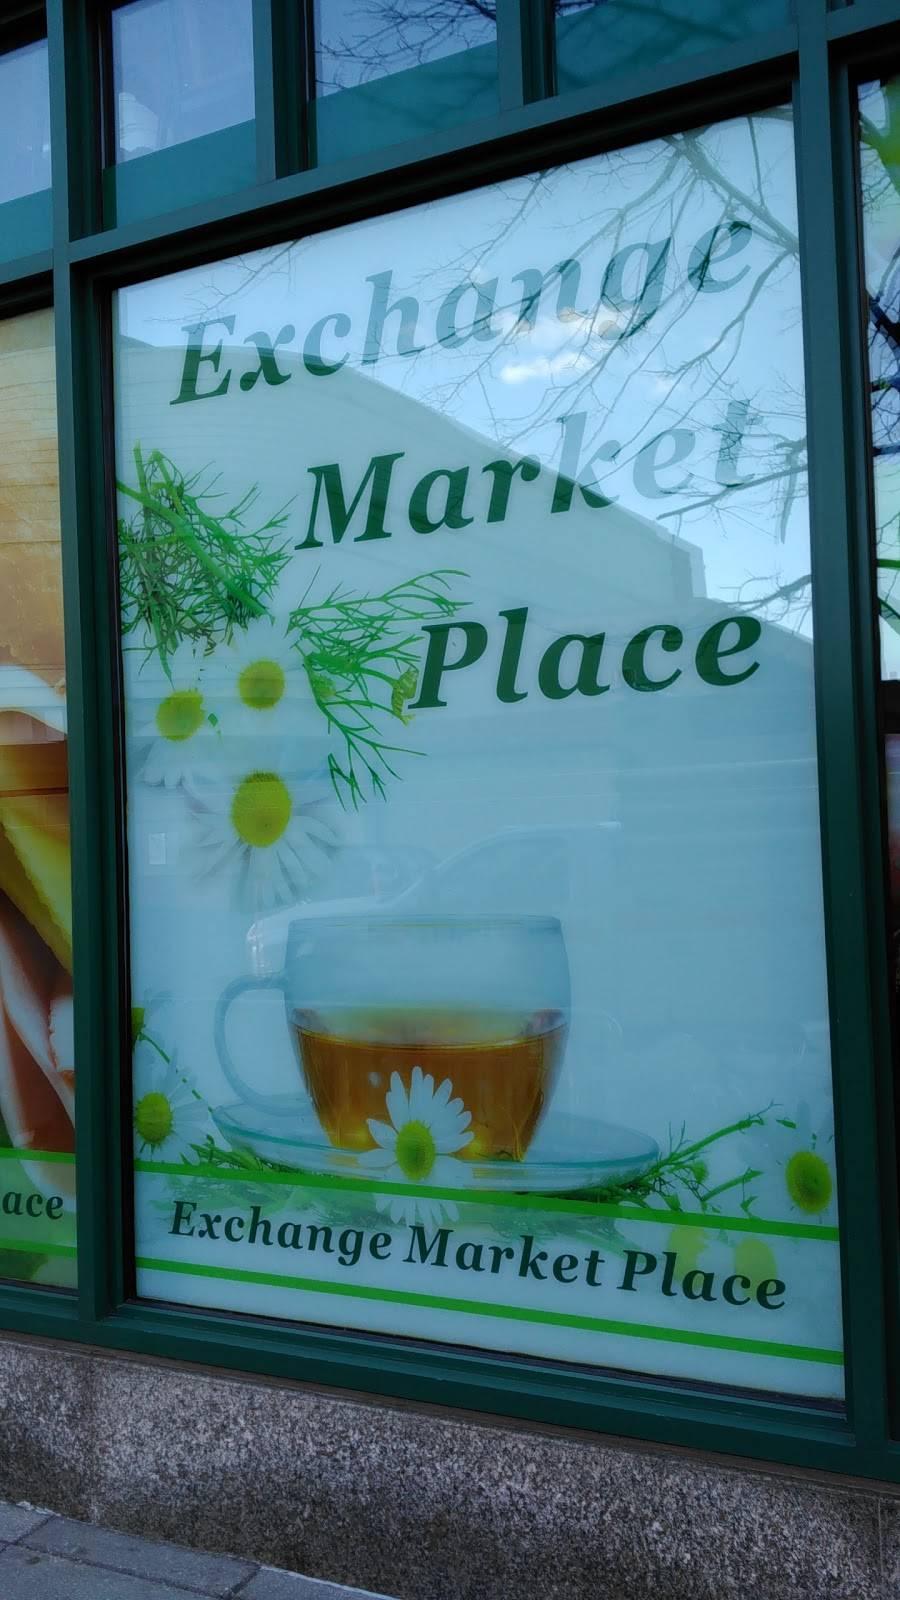 Exchange Market Place | restaurant | 10 Exchange Pl, Jersey City, NJ 07302, USA | 2014512400 OR +1 201-451-2400